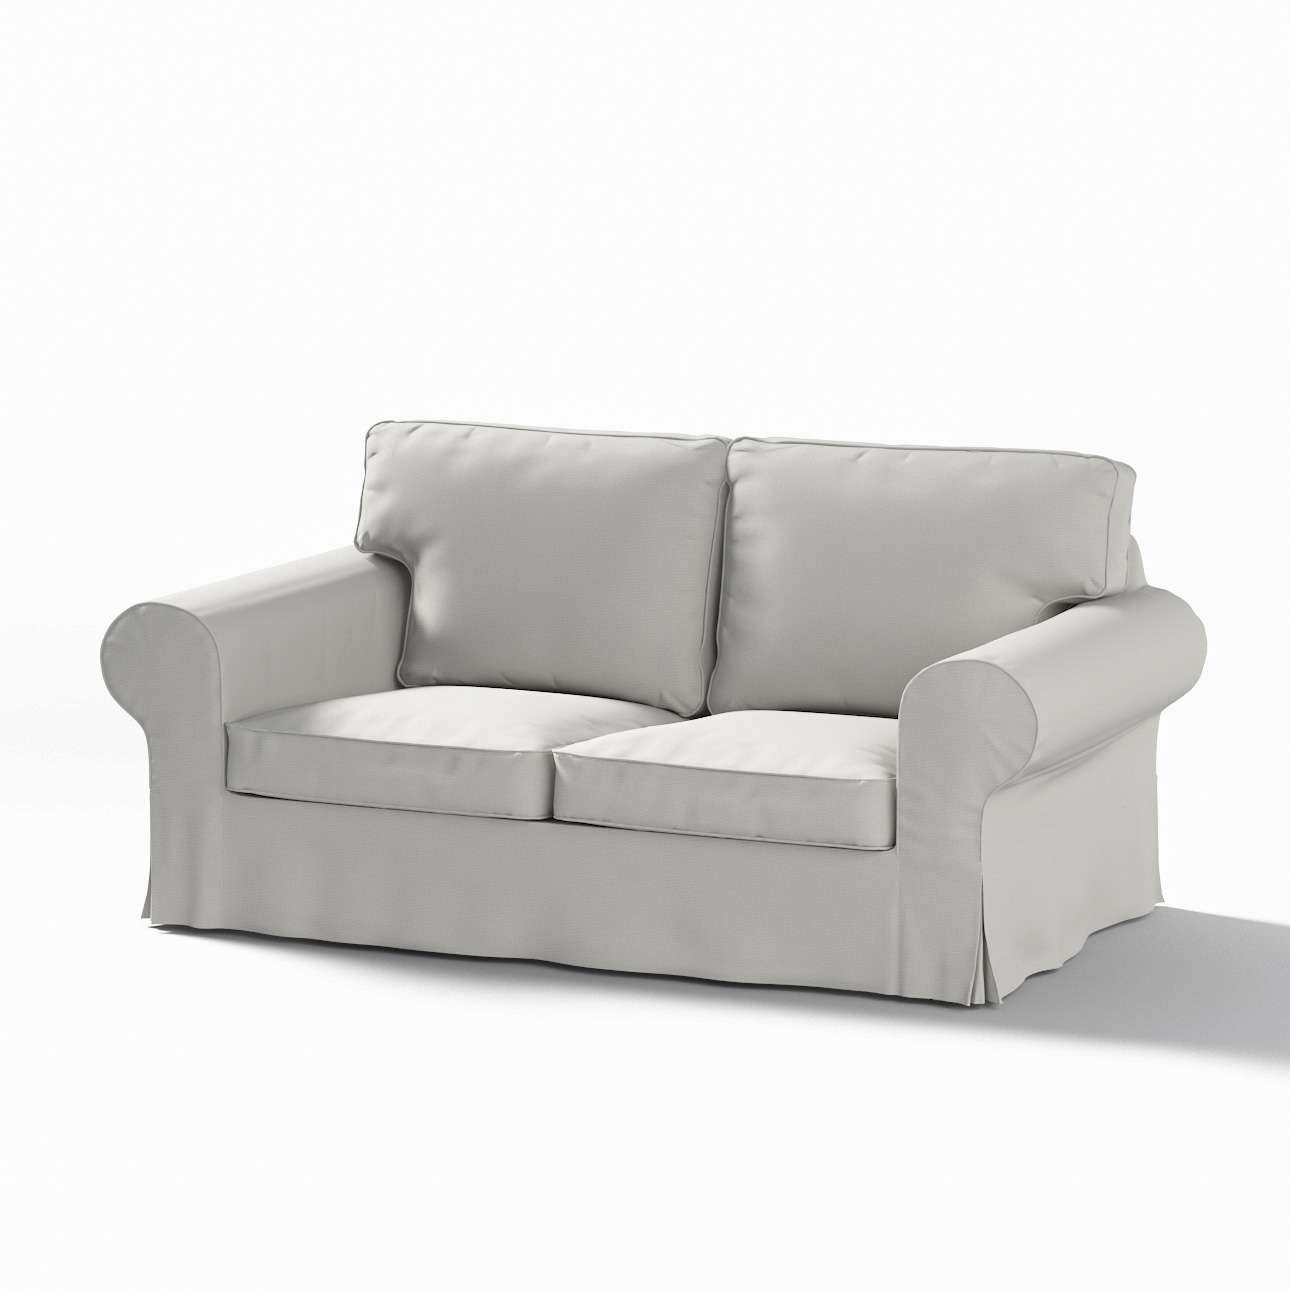 Ektorp 2-Sitzer Schlafsofabezug  ALTES Modell Sofabezug Ektorp 2-Sitzer Schlafsofa altes Modell von der Kollektion Etna, Stoff: 705-90